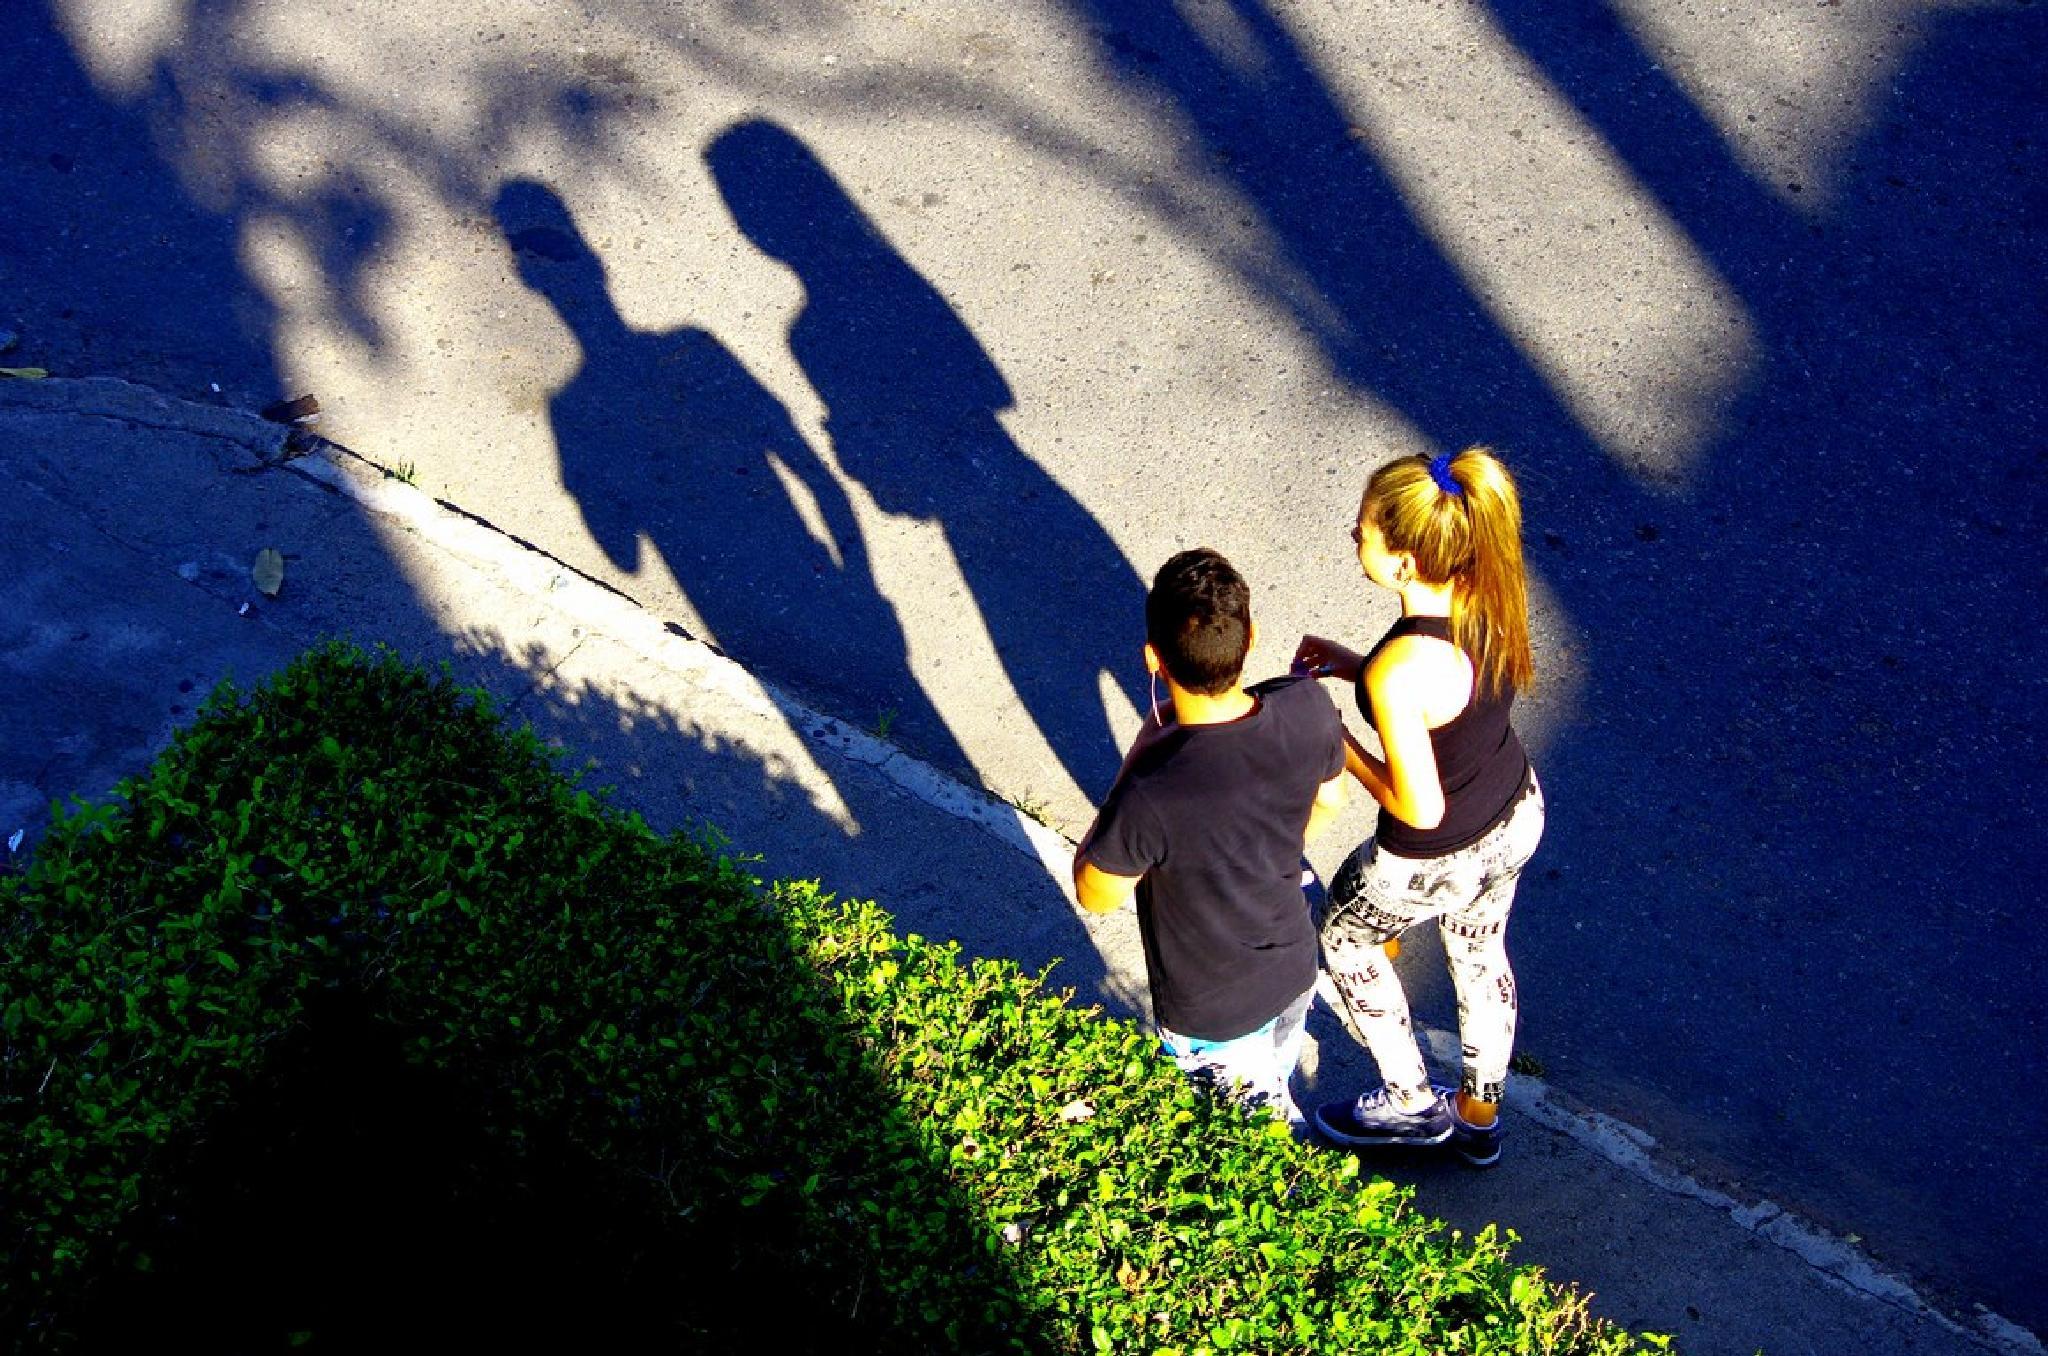 Morning shadows by Dan Steeves